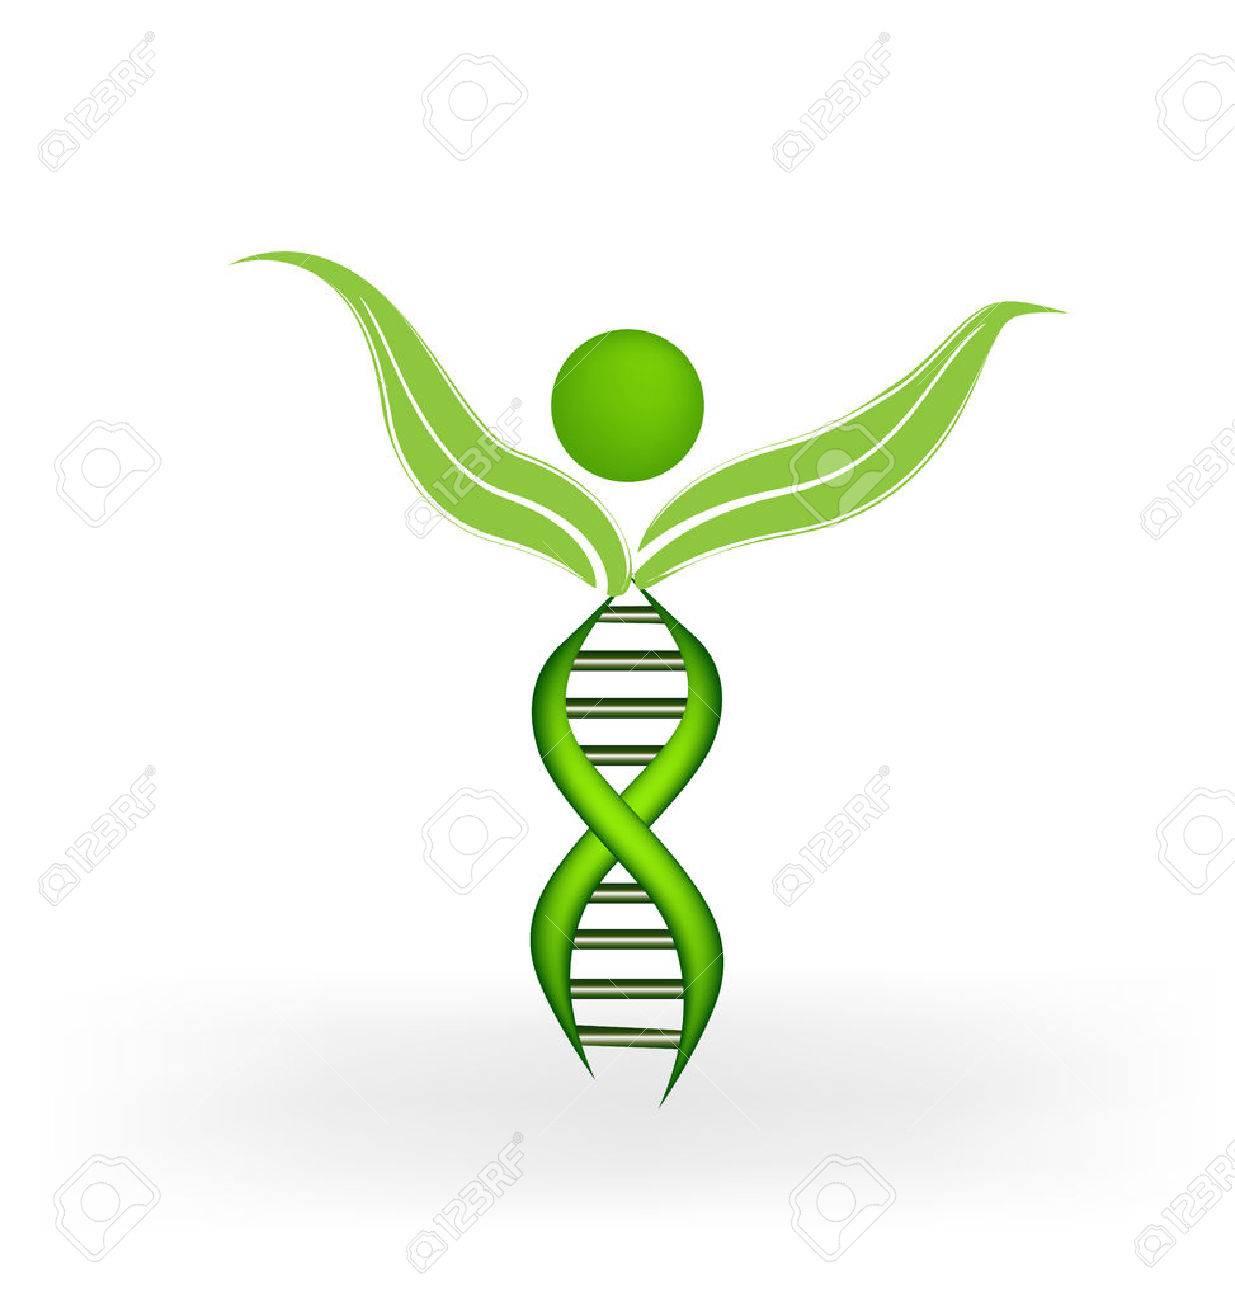 DNA Strands figure vector icon - 40602125